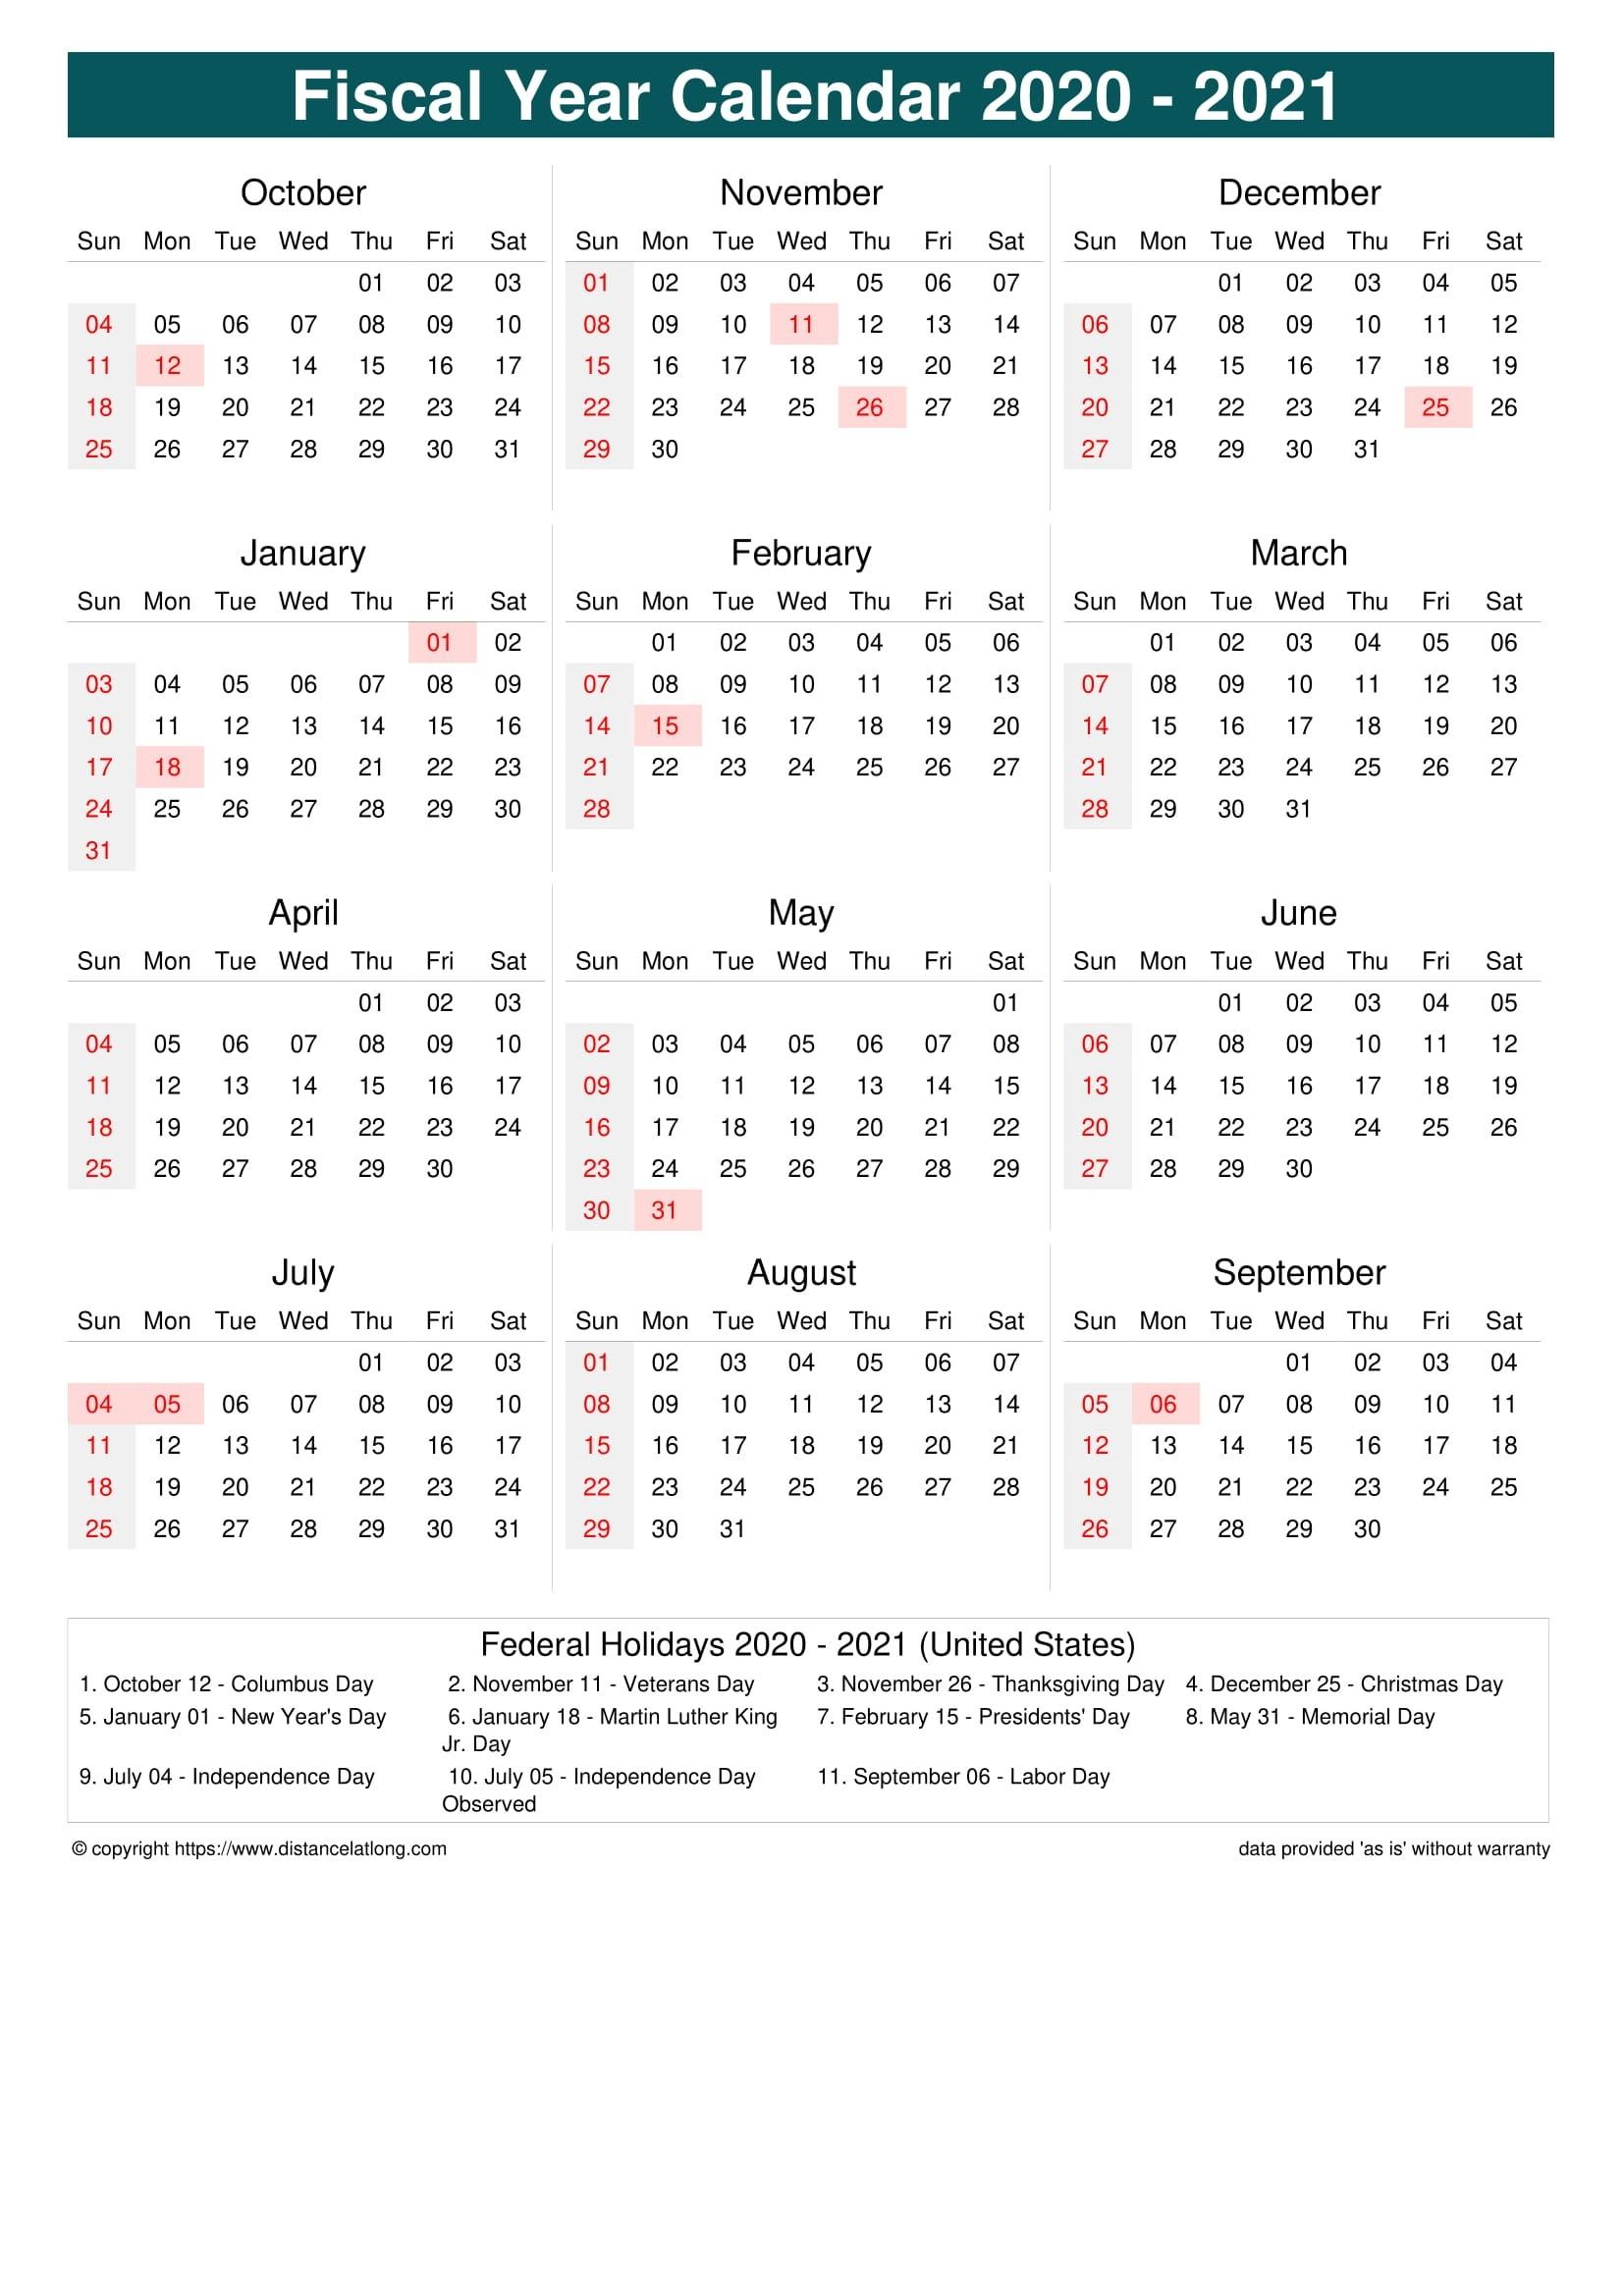 Fiscal Year 2020-2021 Calendar Templates, Free Printable  Fiscal Year Australia 2021